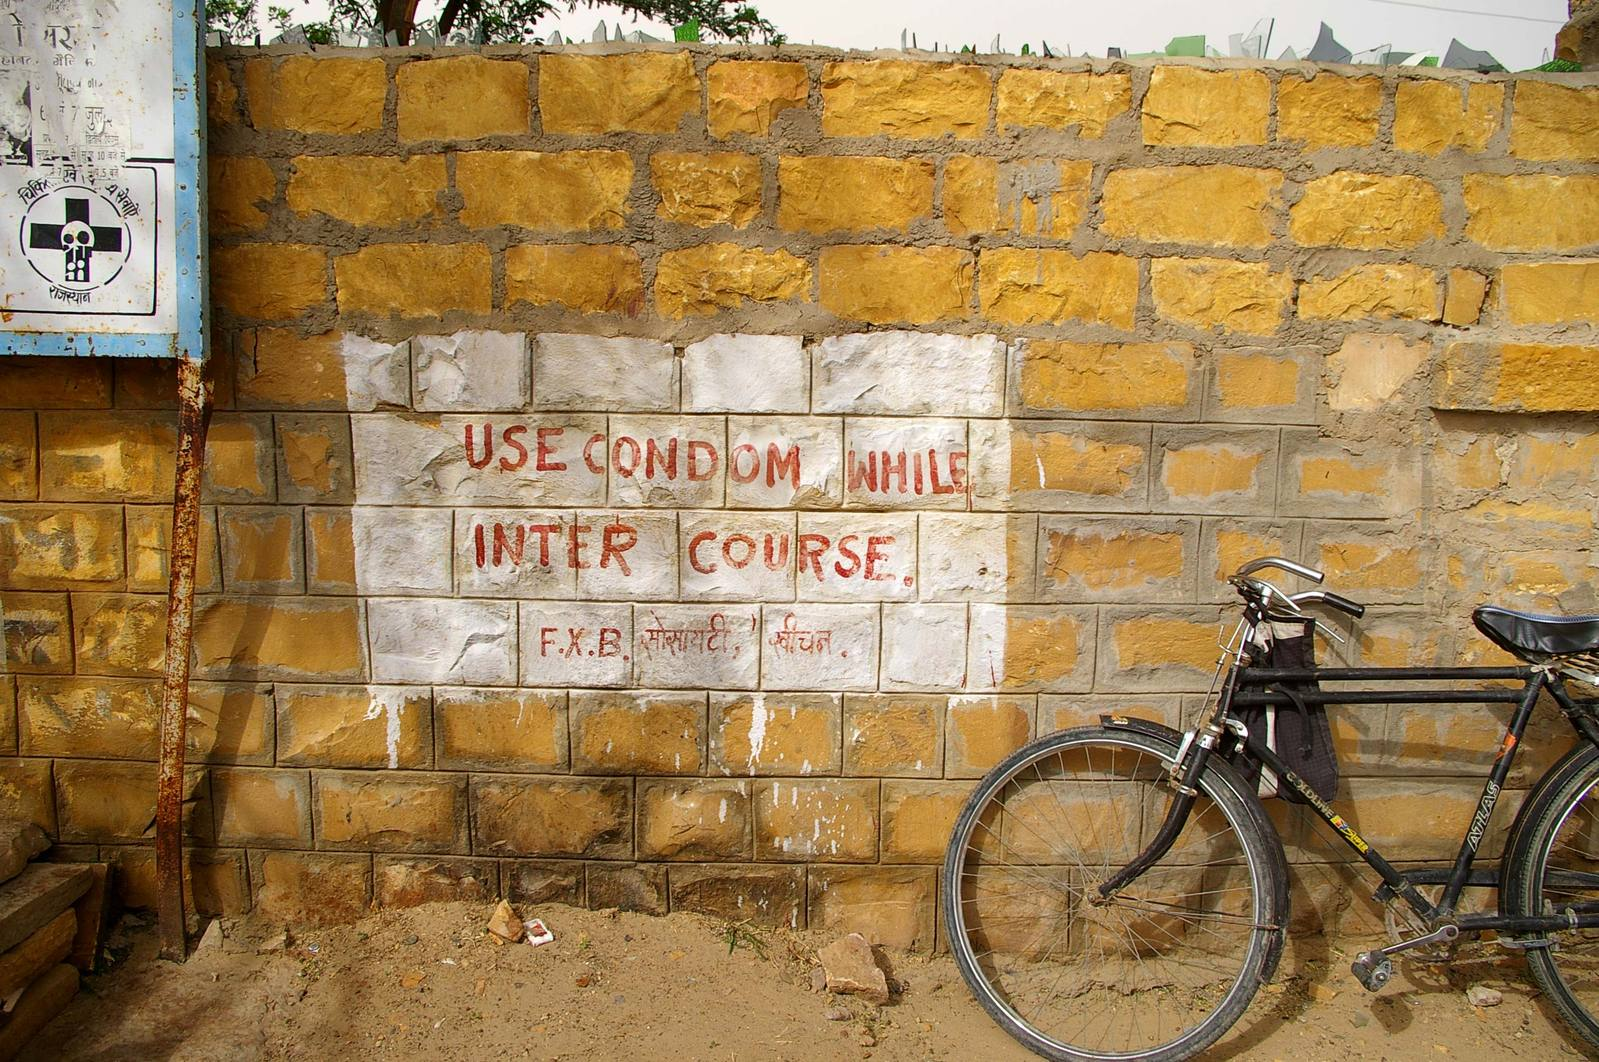 Ein Graffiti auf dem Steht Use Condom while intercourse